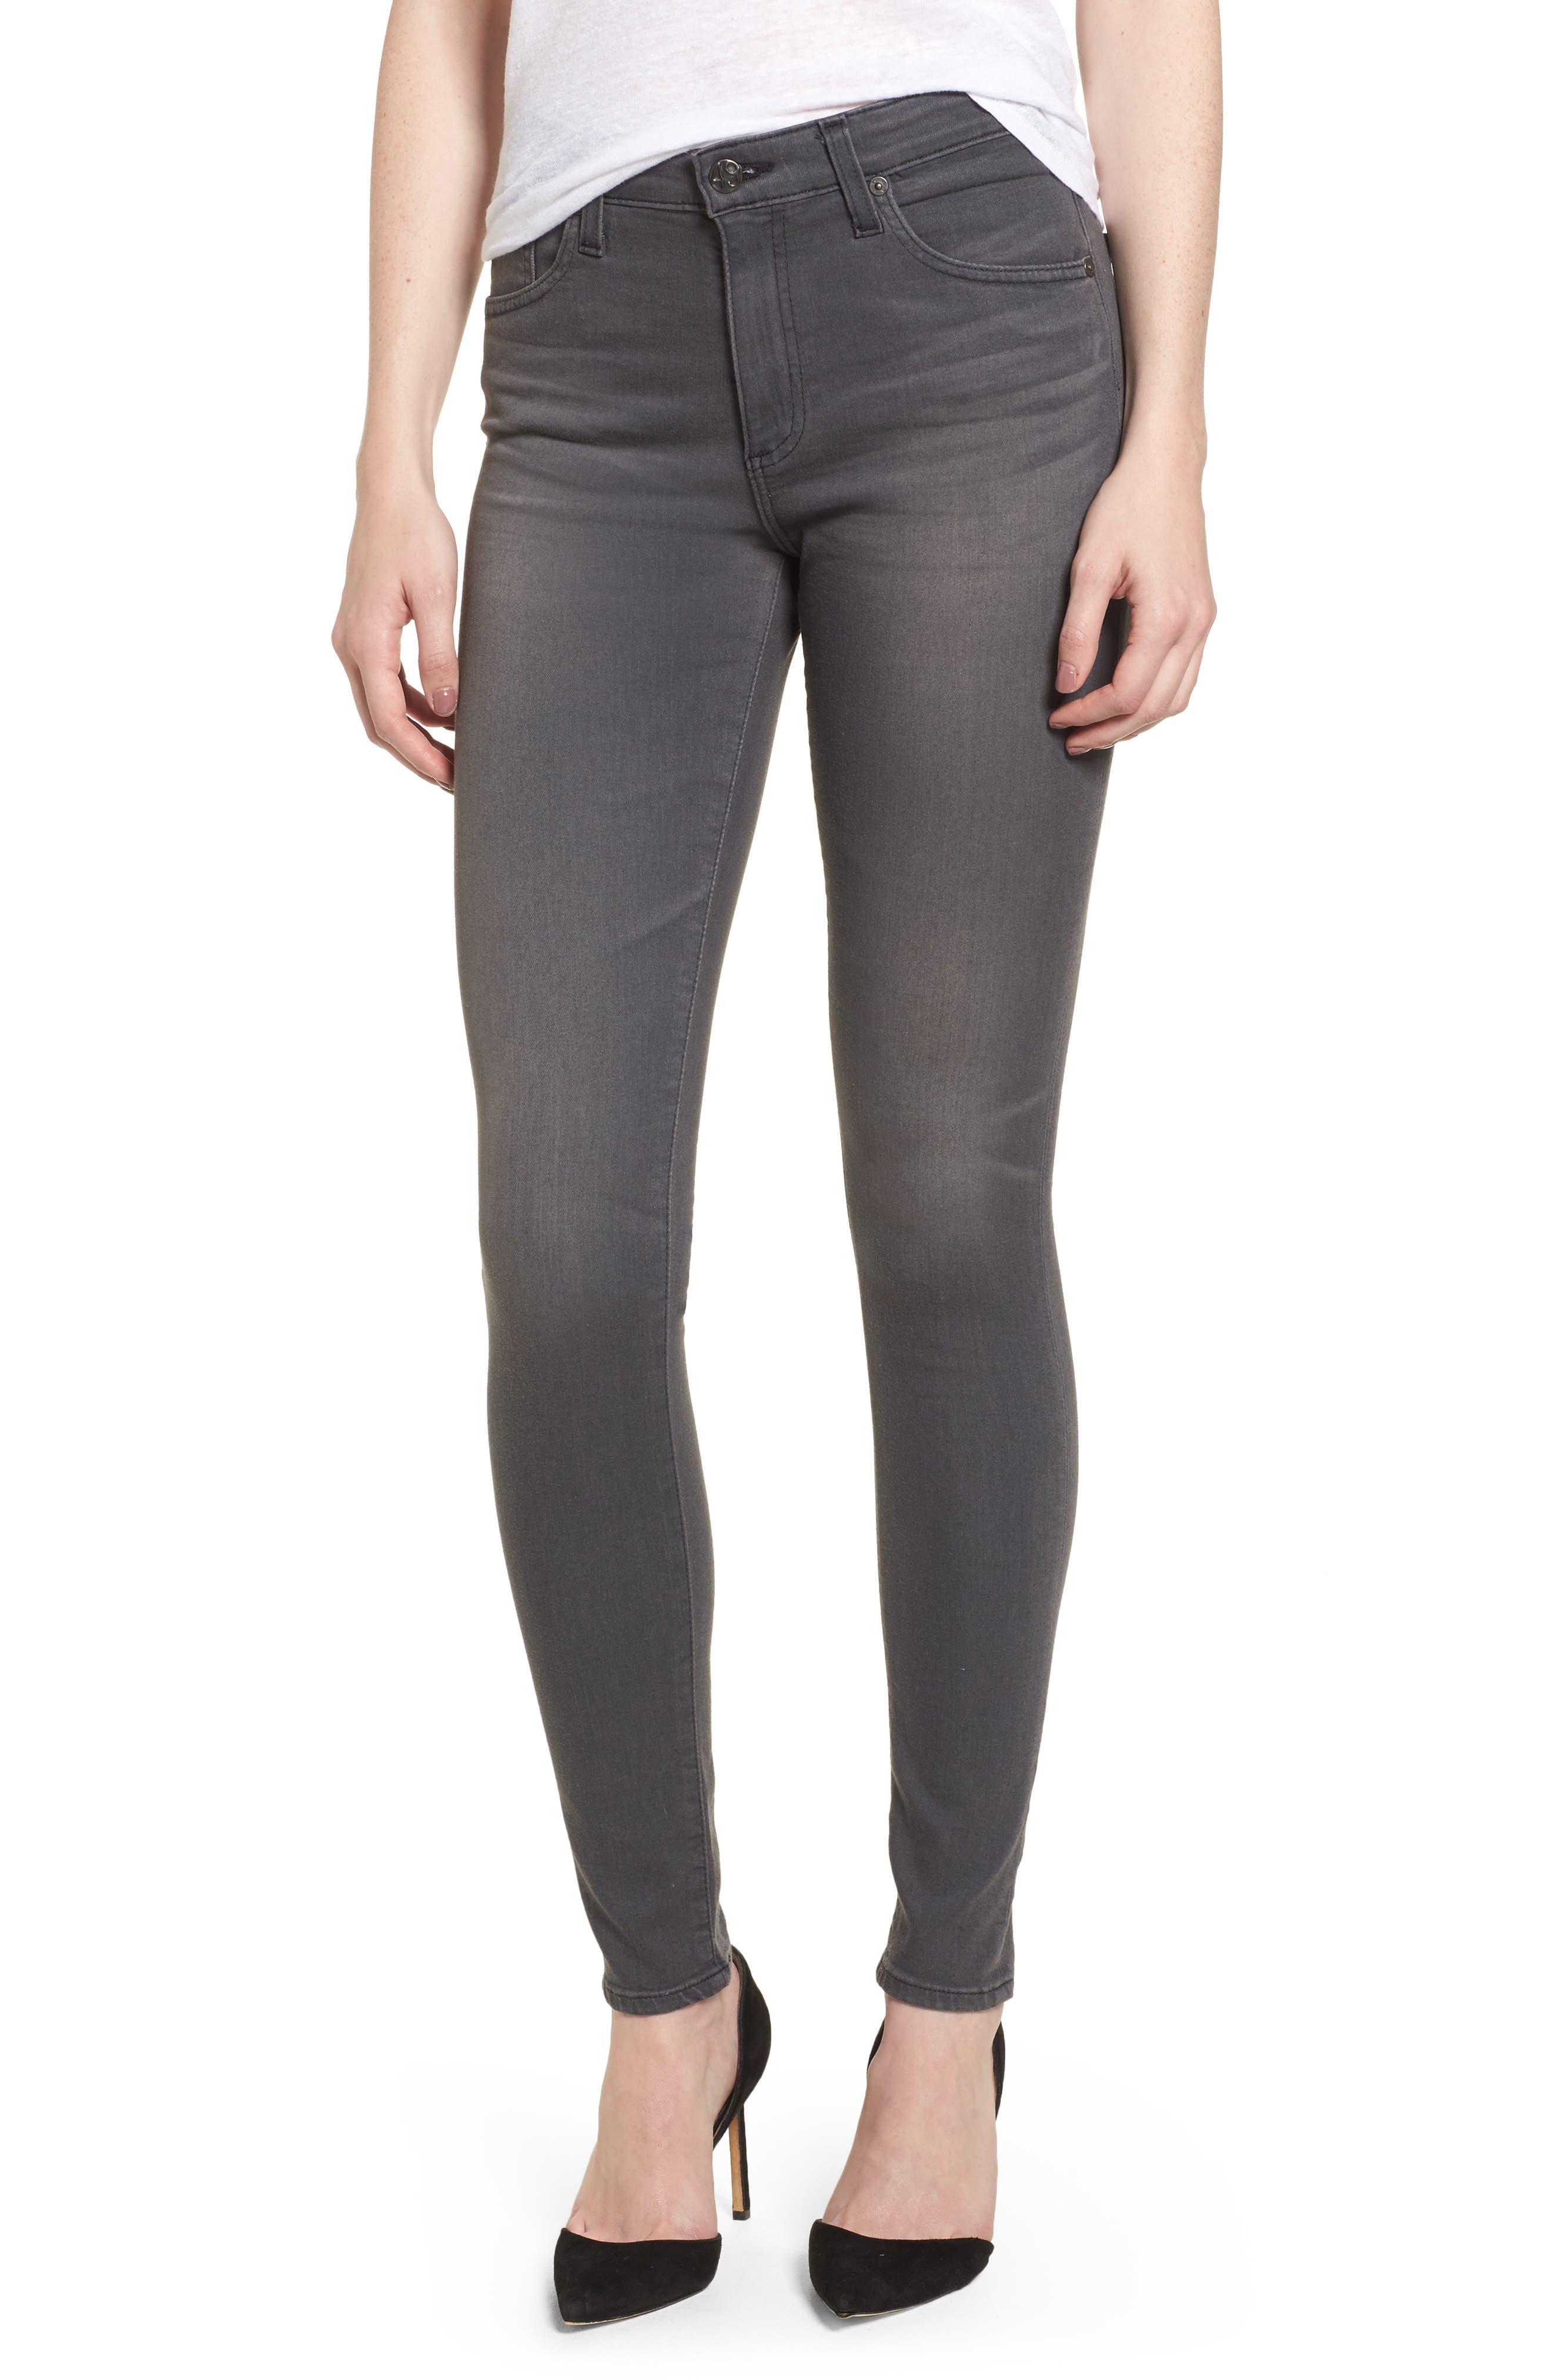 Alternate Image 1 Selected - AG Farrah High WaistSkinny Jeans (4 Years Earl Grey)